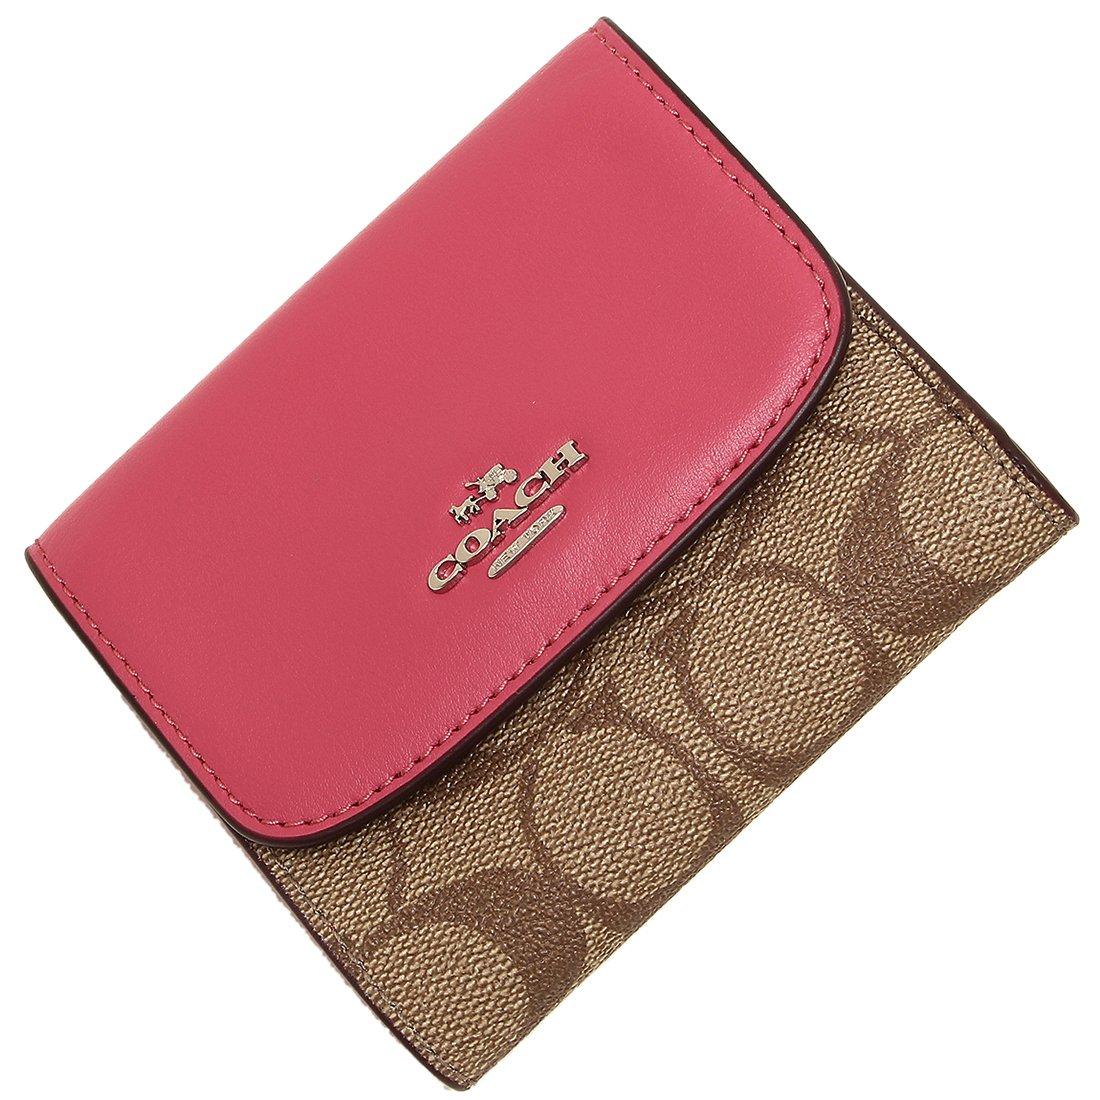 55be63eac661 Amazon | [コーチ] 三つ折り財布 アウトレット レディース COACH F87589 SKHMJ カーキ ピンク [並行輸入品] | 財布